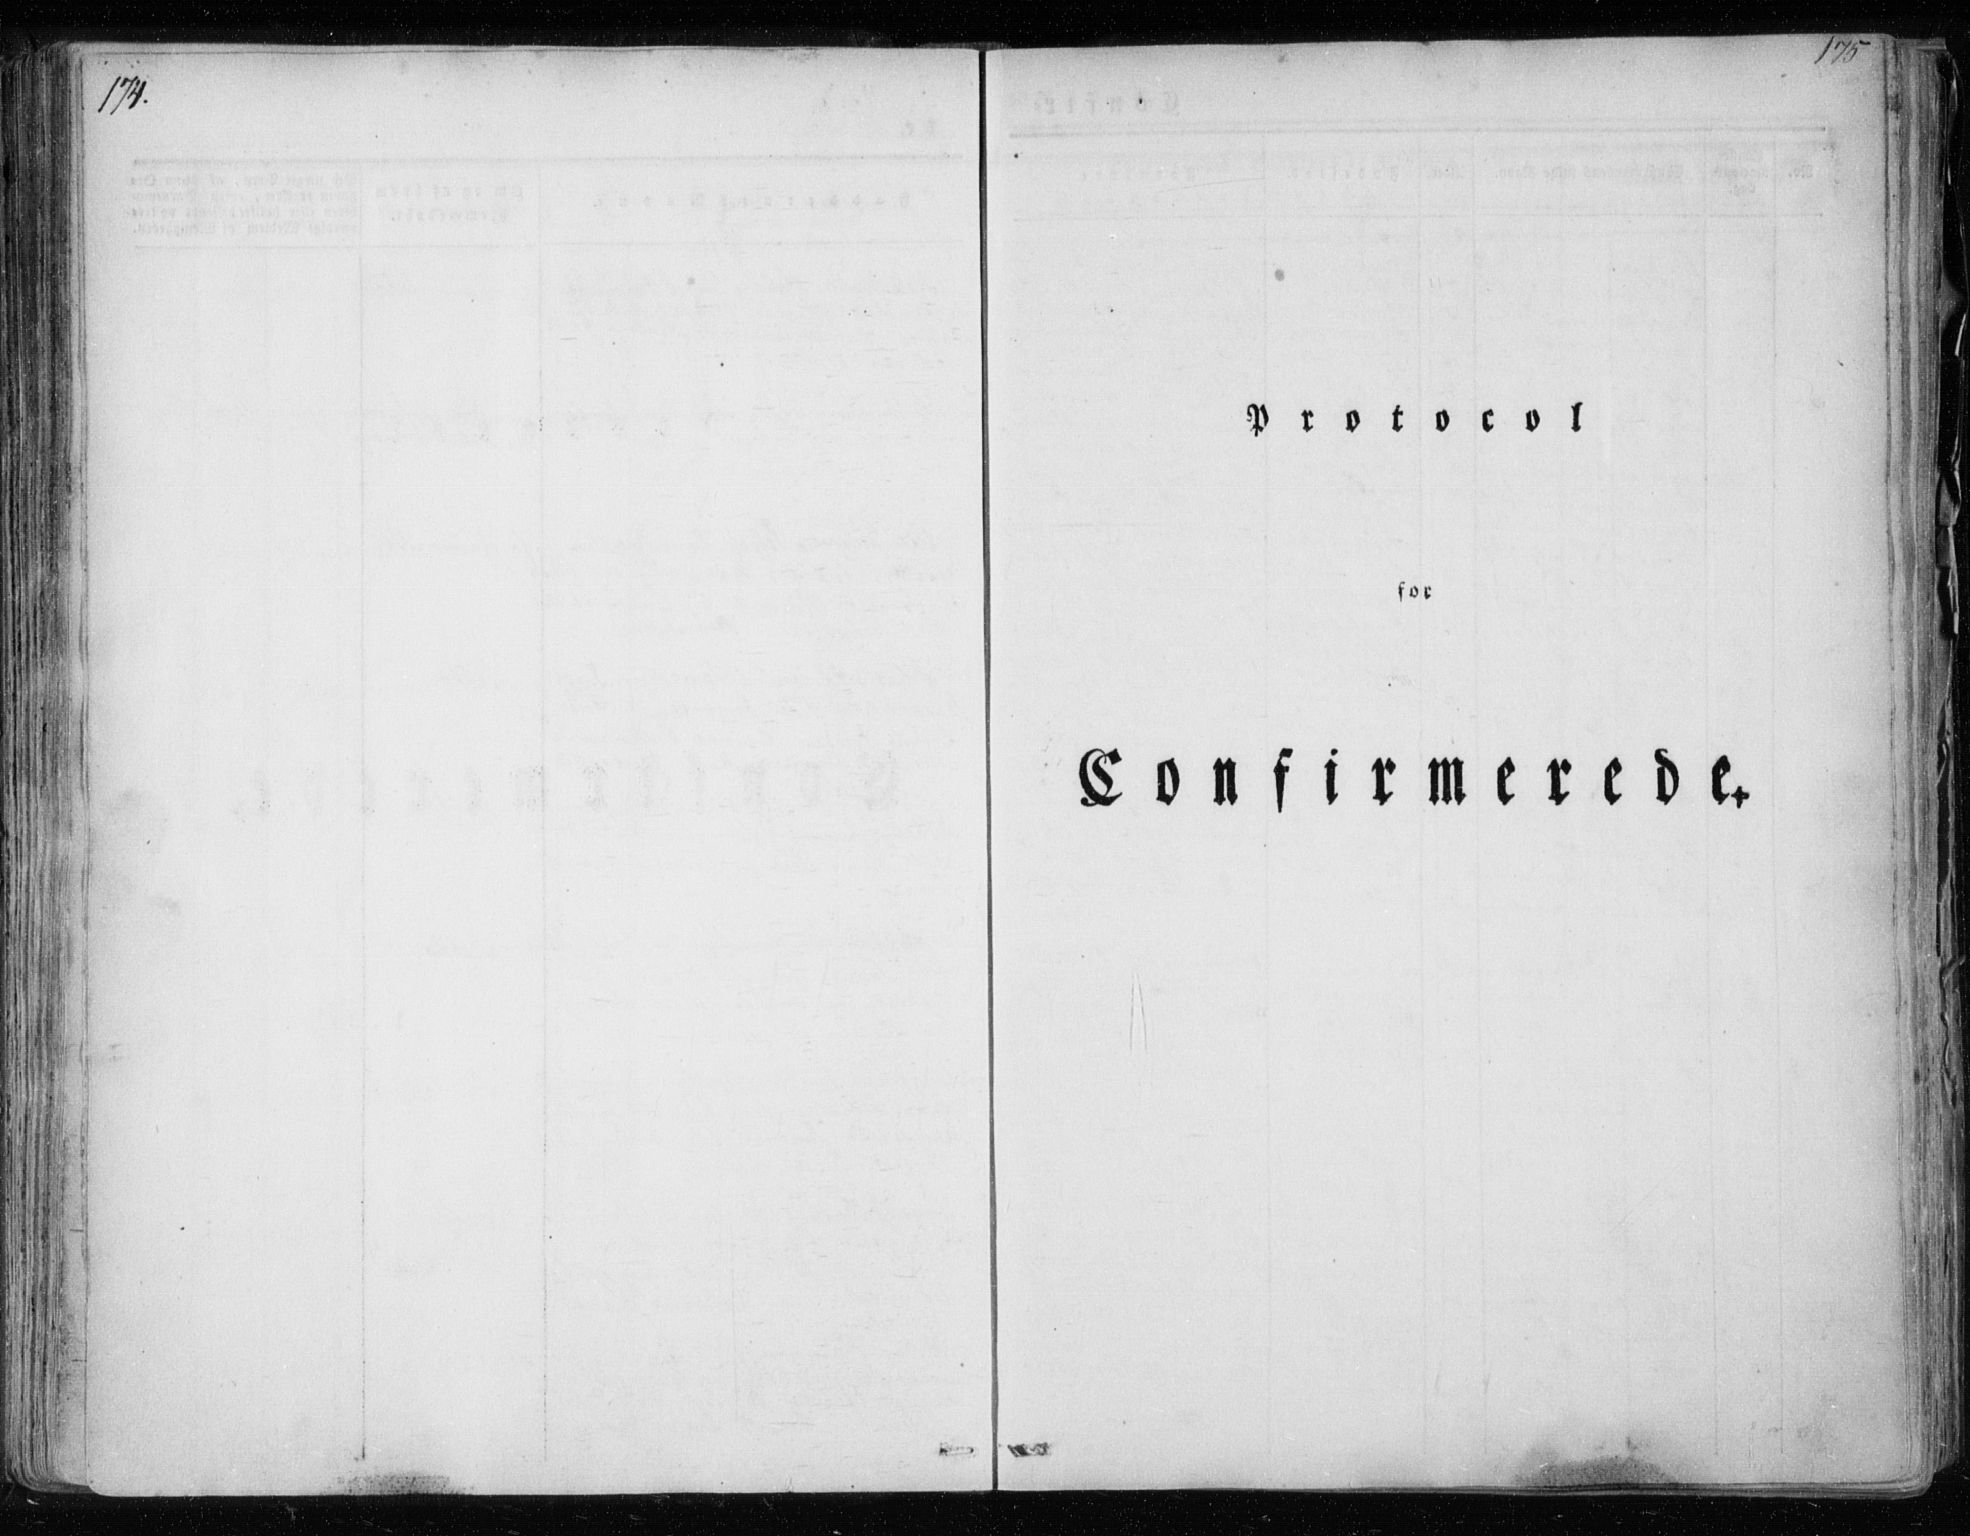 SAT, Ministerialprotokoller, klokkerbøker og fødselsregistre - Nordland, 825/L0354: Ministerialbok nr. 825A08, 1826-1841, s. 174-175